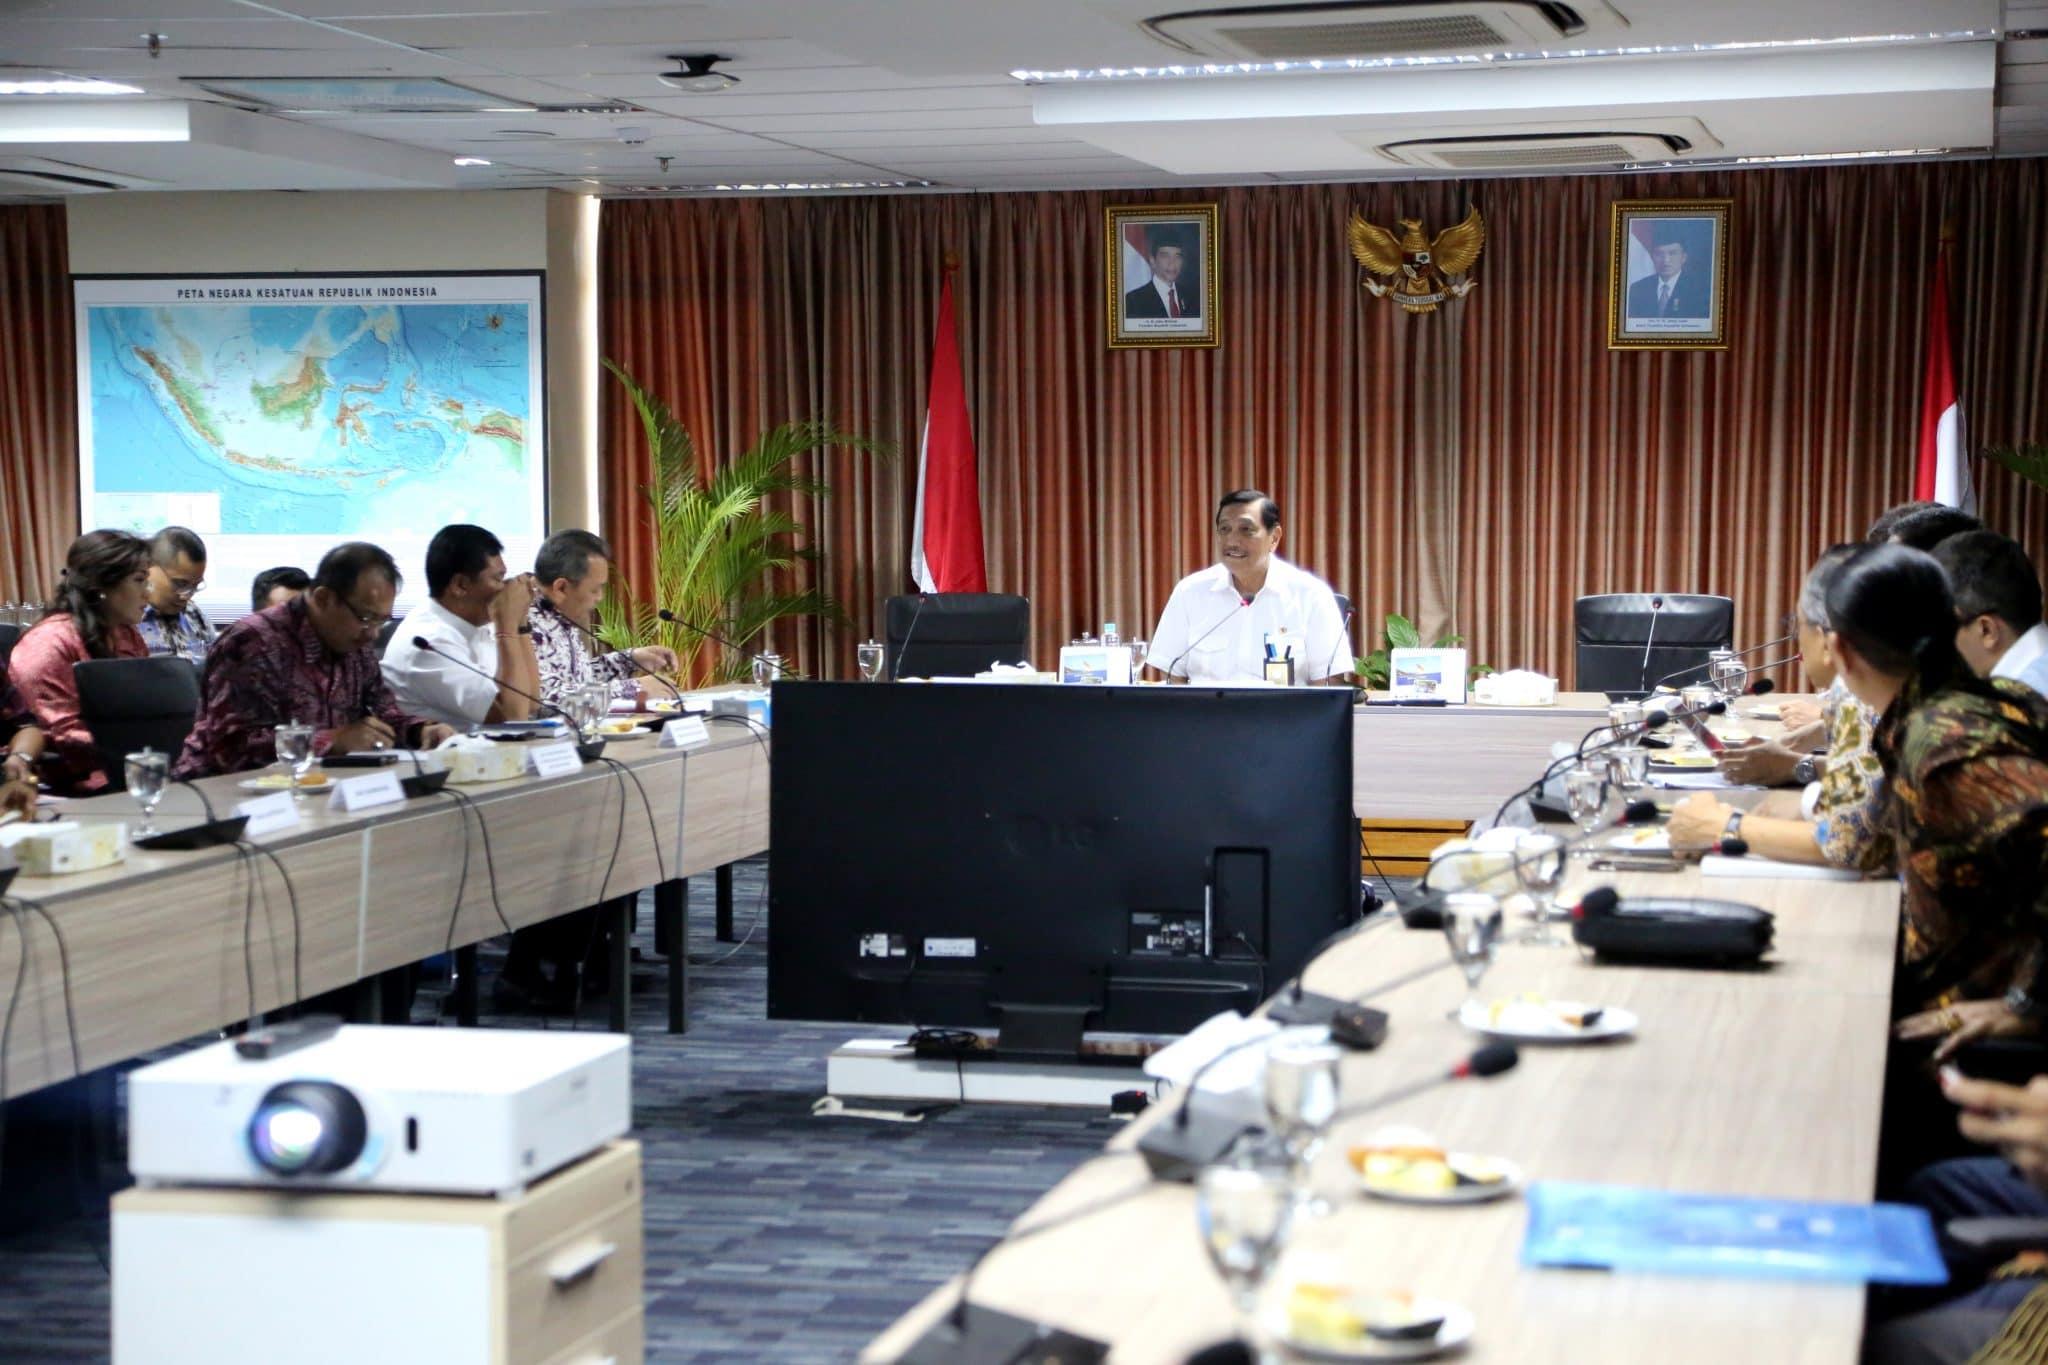 Menko Luhut Pimpin Rakor Pembangunan Infrastruktur Terpadu Bali